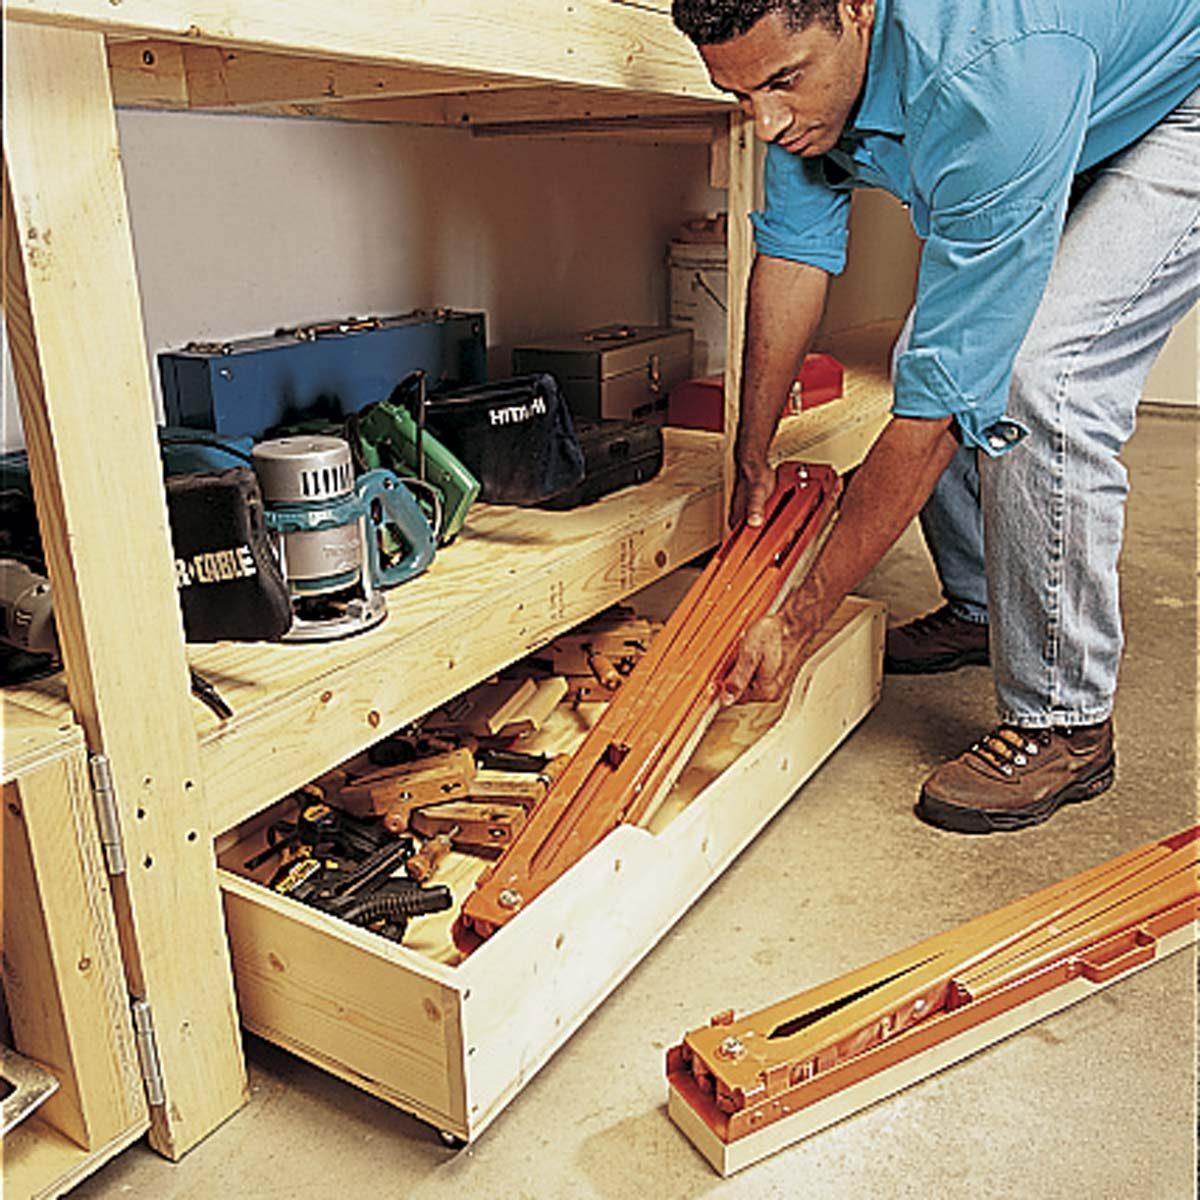 Modular Workbench Plans: How To Build A Modular Workbench